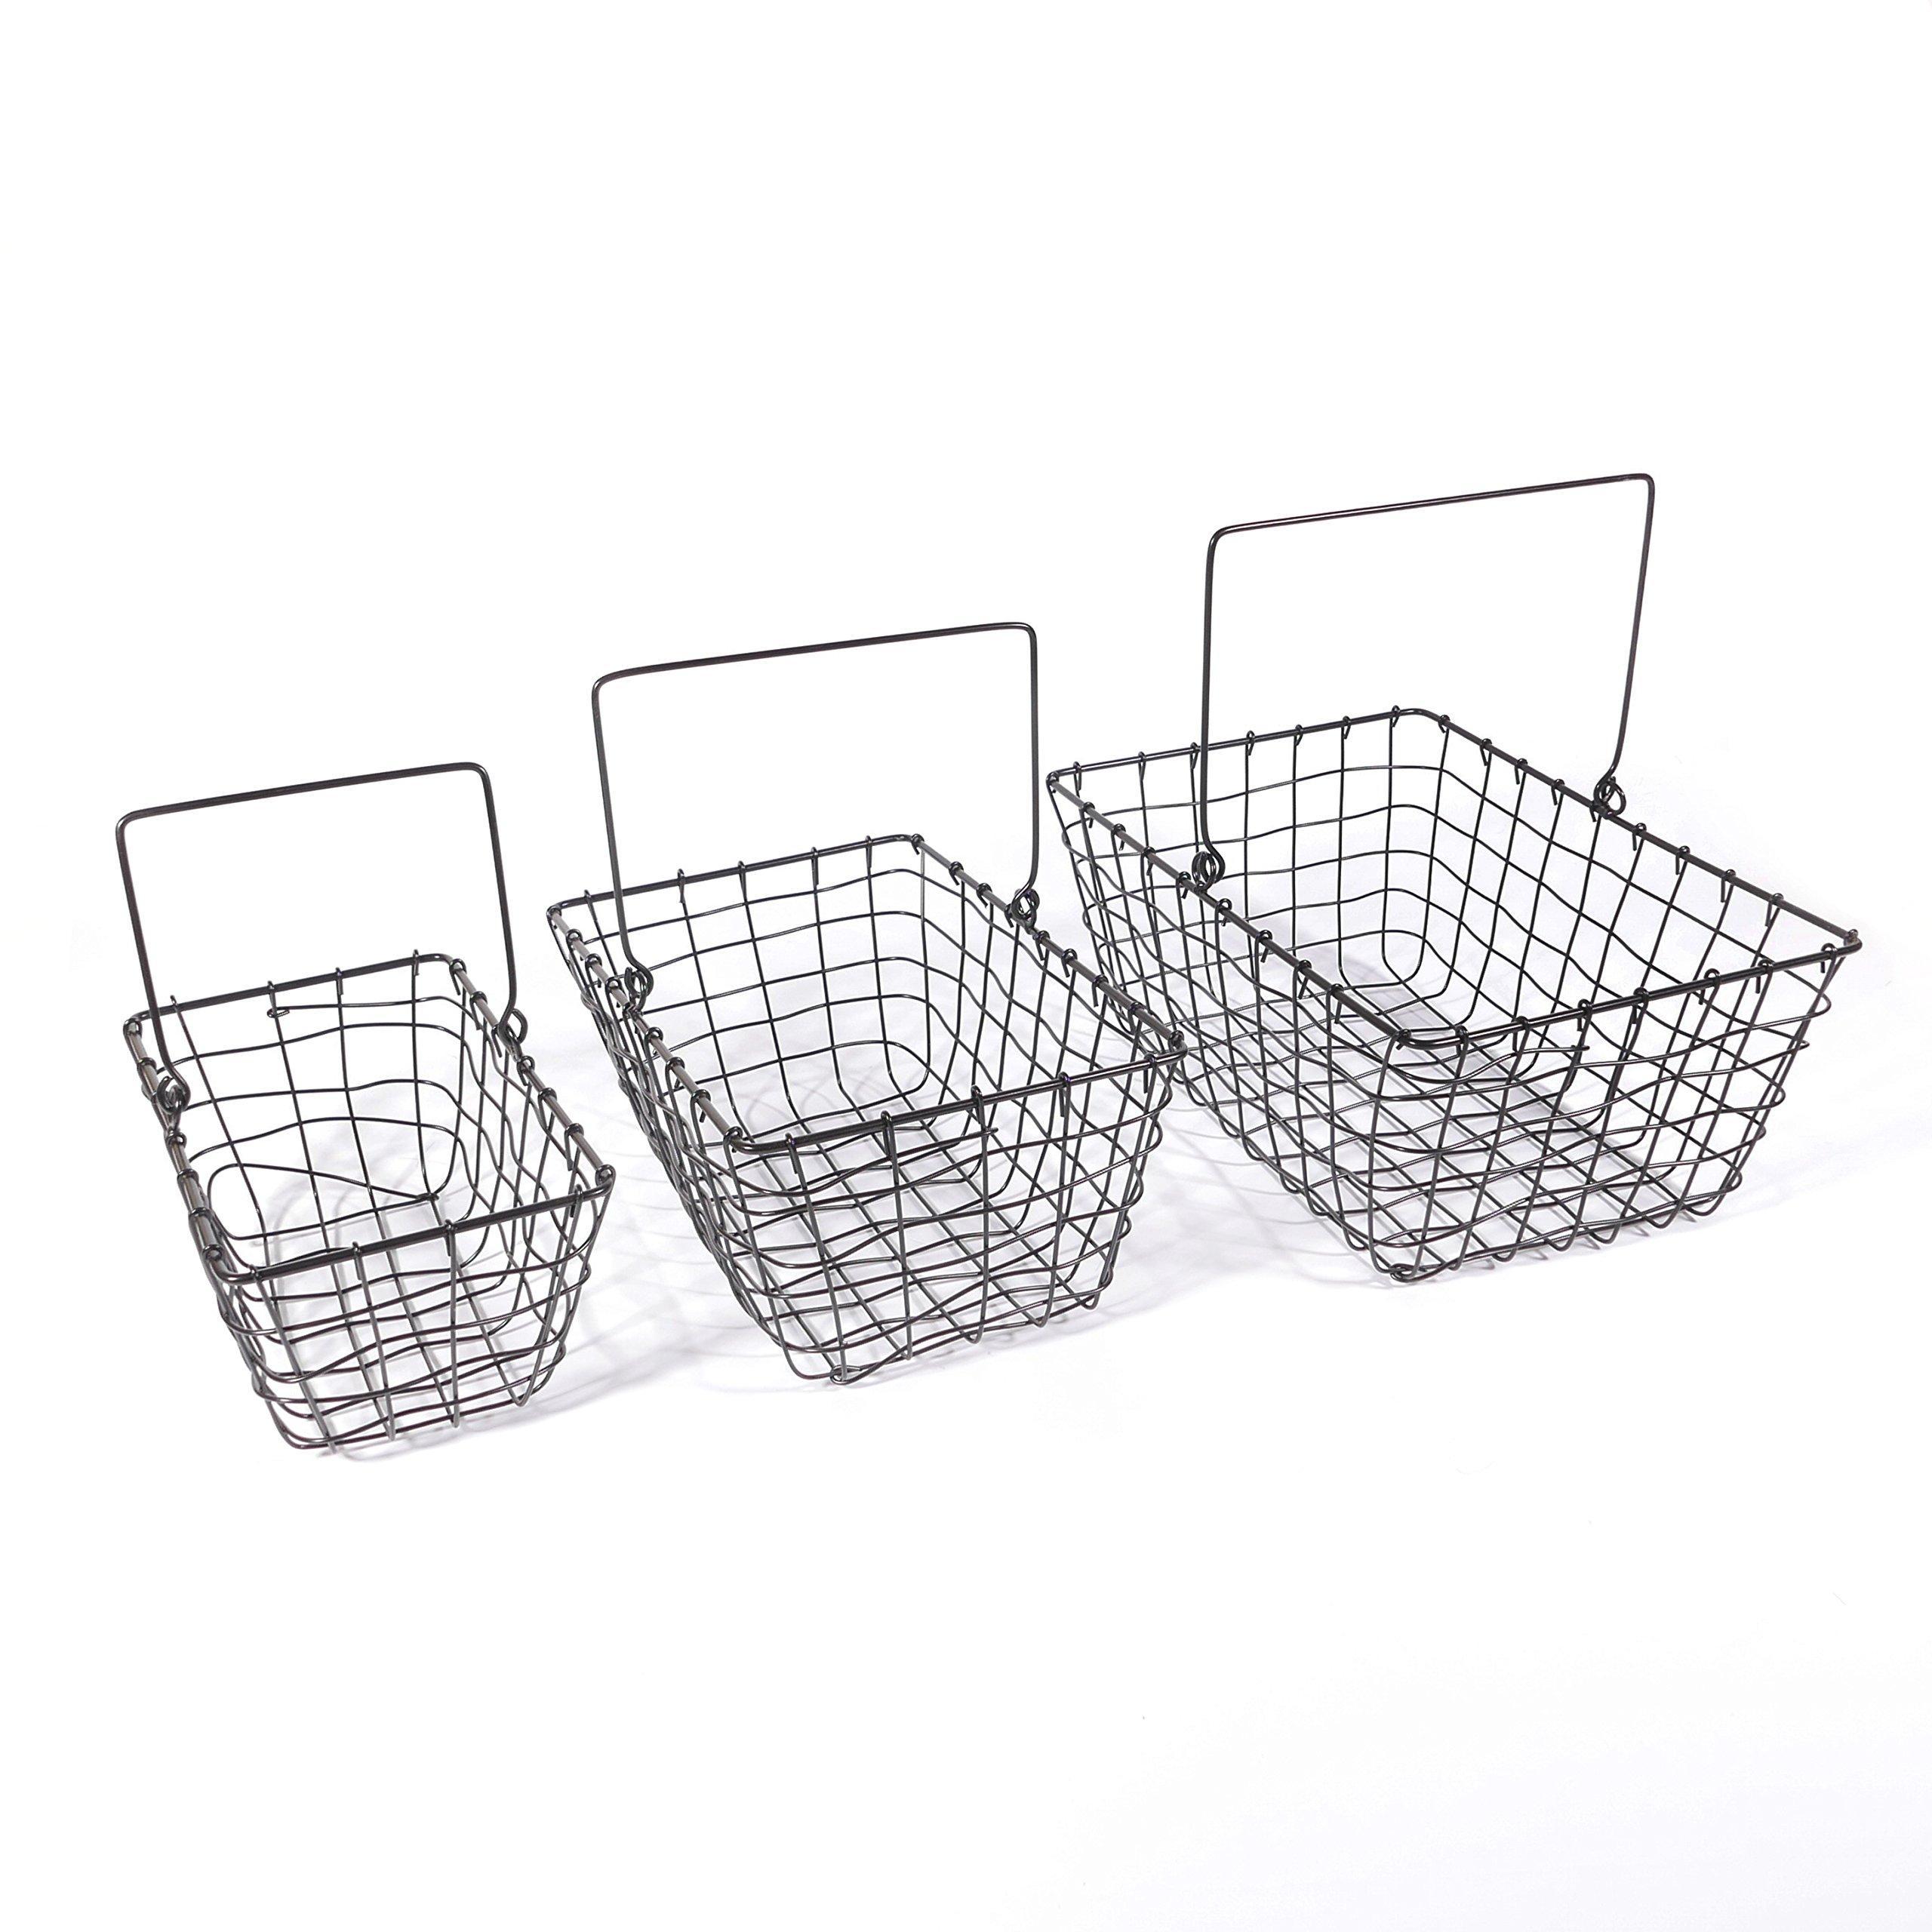 SLPR Wire Storage Basket with Handle (Set of 3, Industrial Gray) | Tapered Rustic Vintage Basket Organizer for Kitchen Dining Room Nursery Garden Freezer